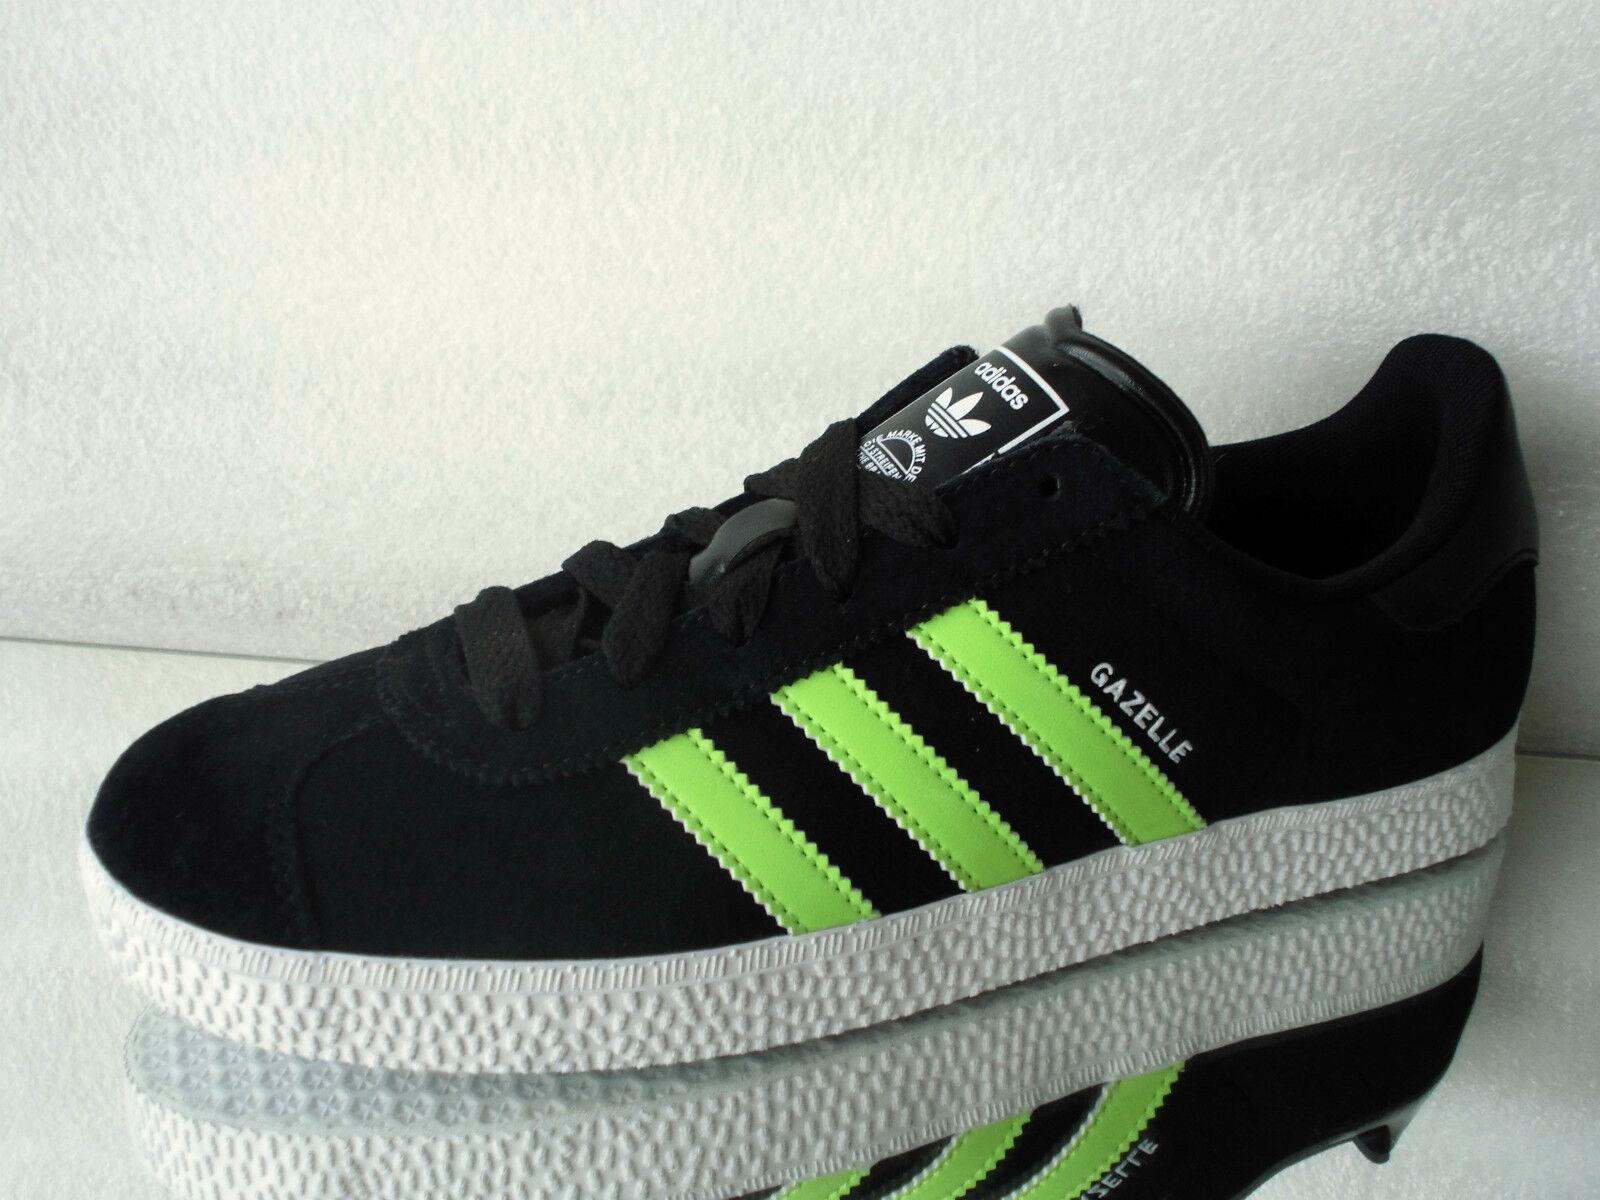 Adidas Gazelle J g56112 turn-Chaussures de course Basket NEUF